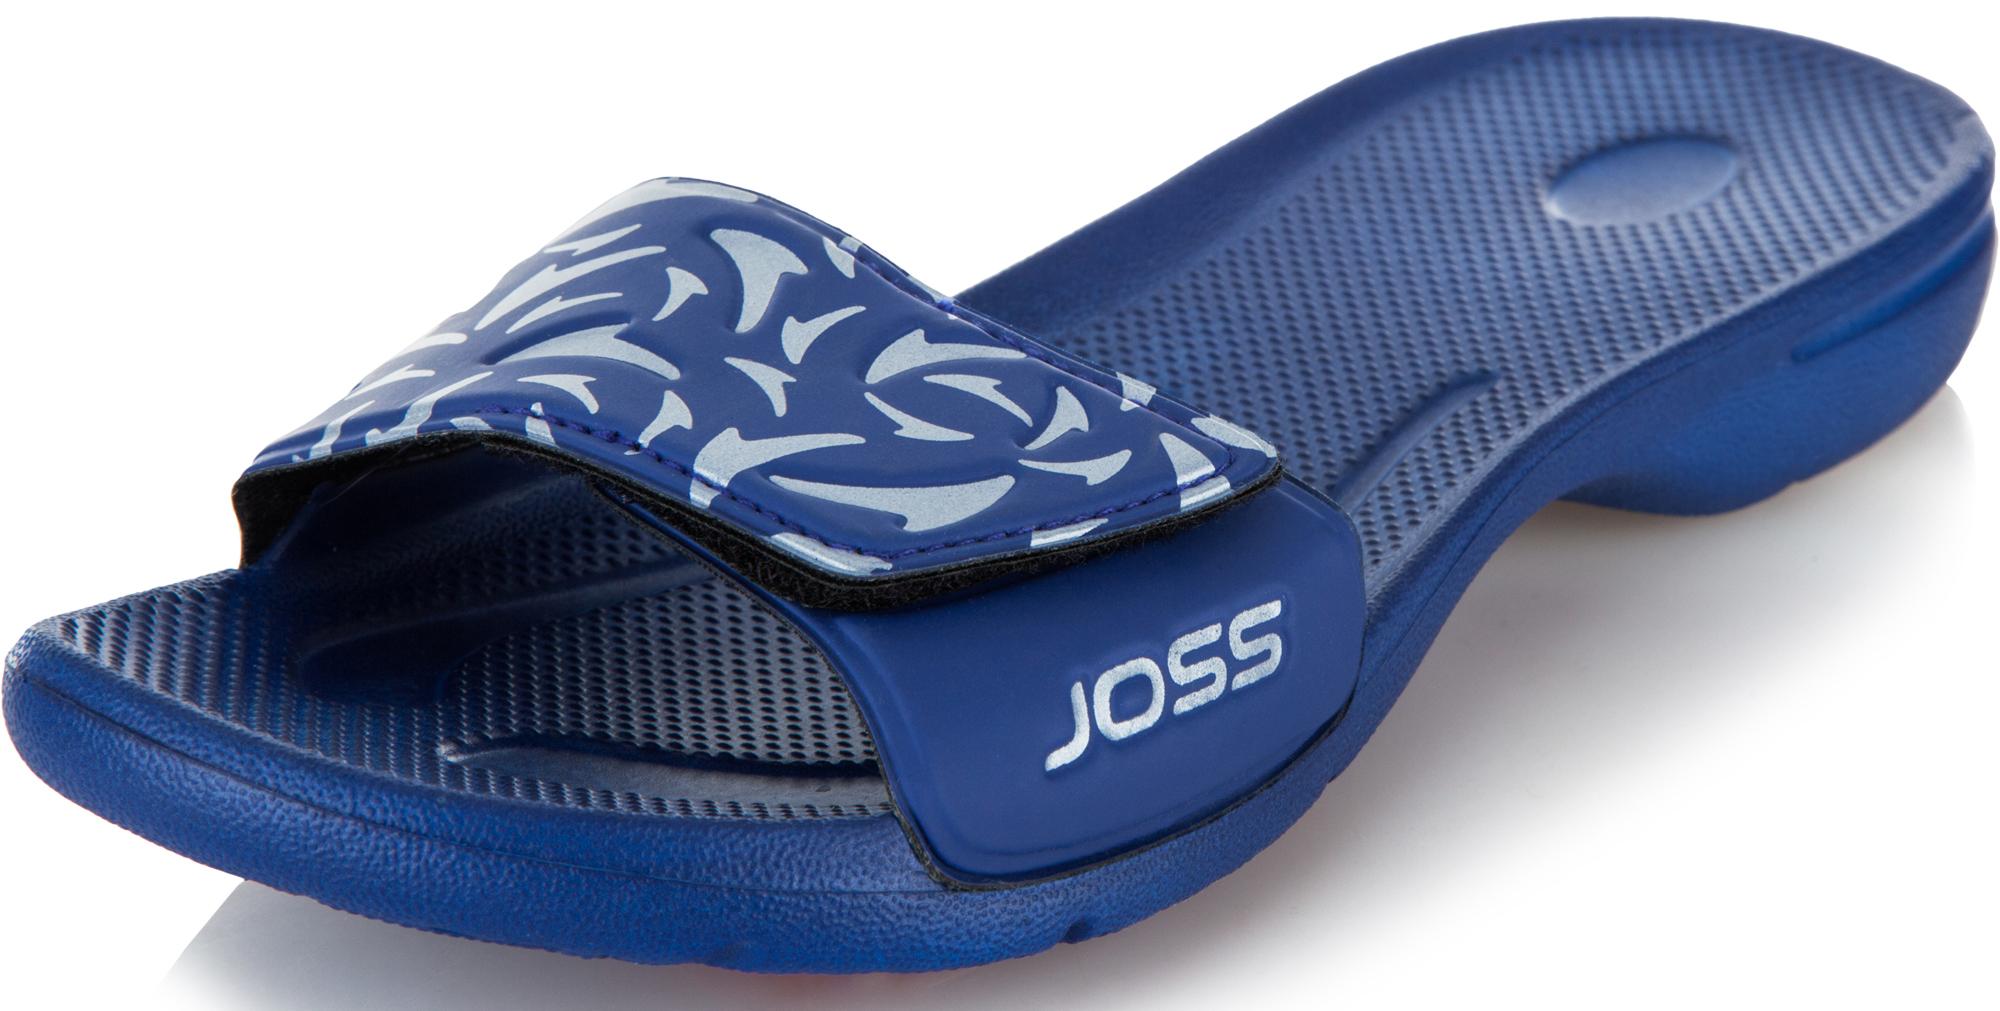 Joss Шлепанцы женские Joss Fantasy, размер 38 цены онлайн